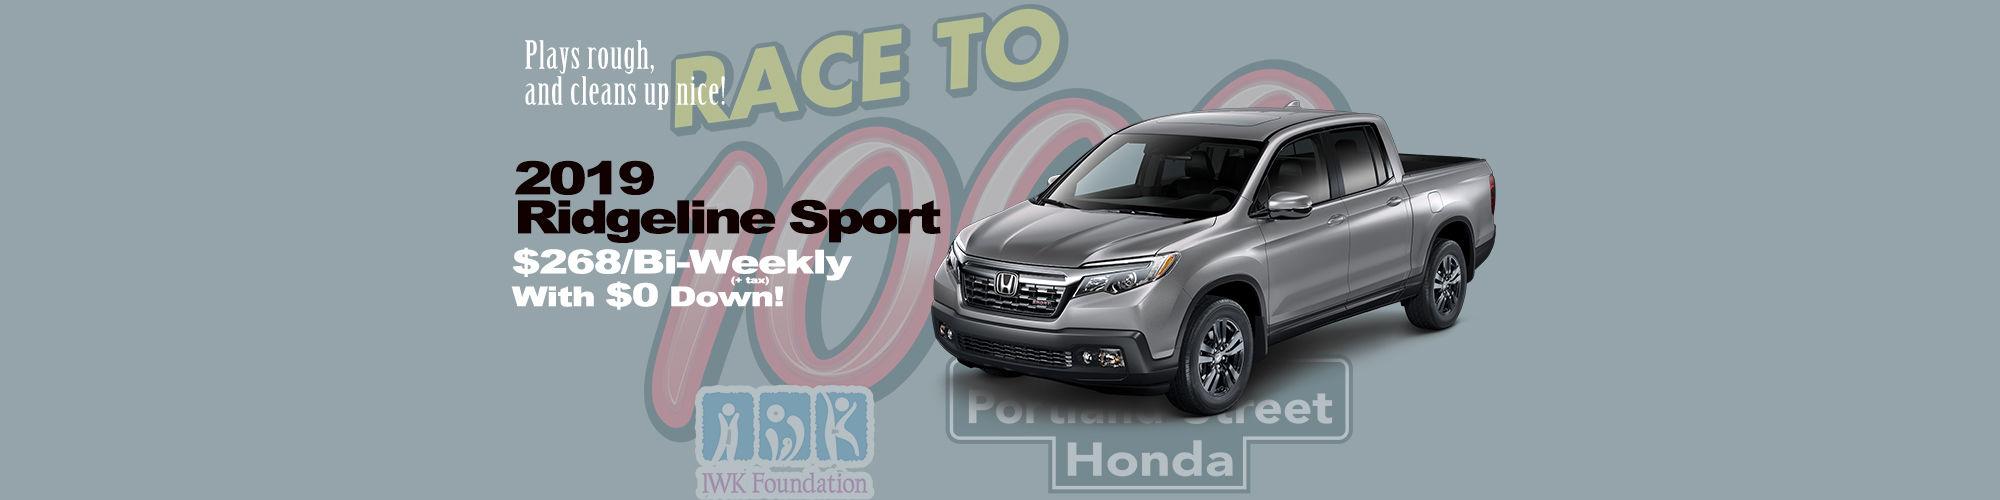 Honda Ridgeline $268/Bi-Weekly